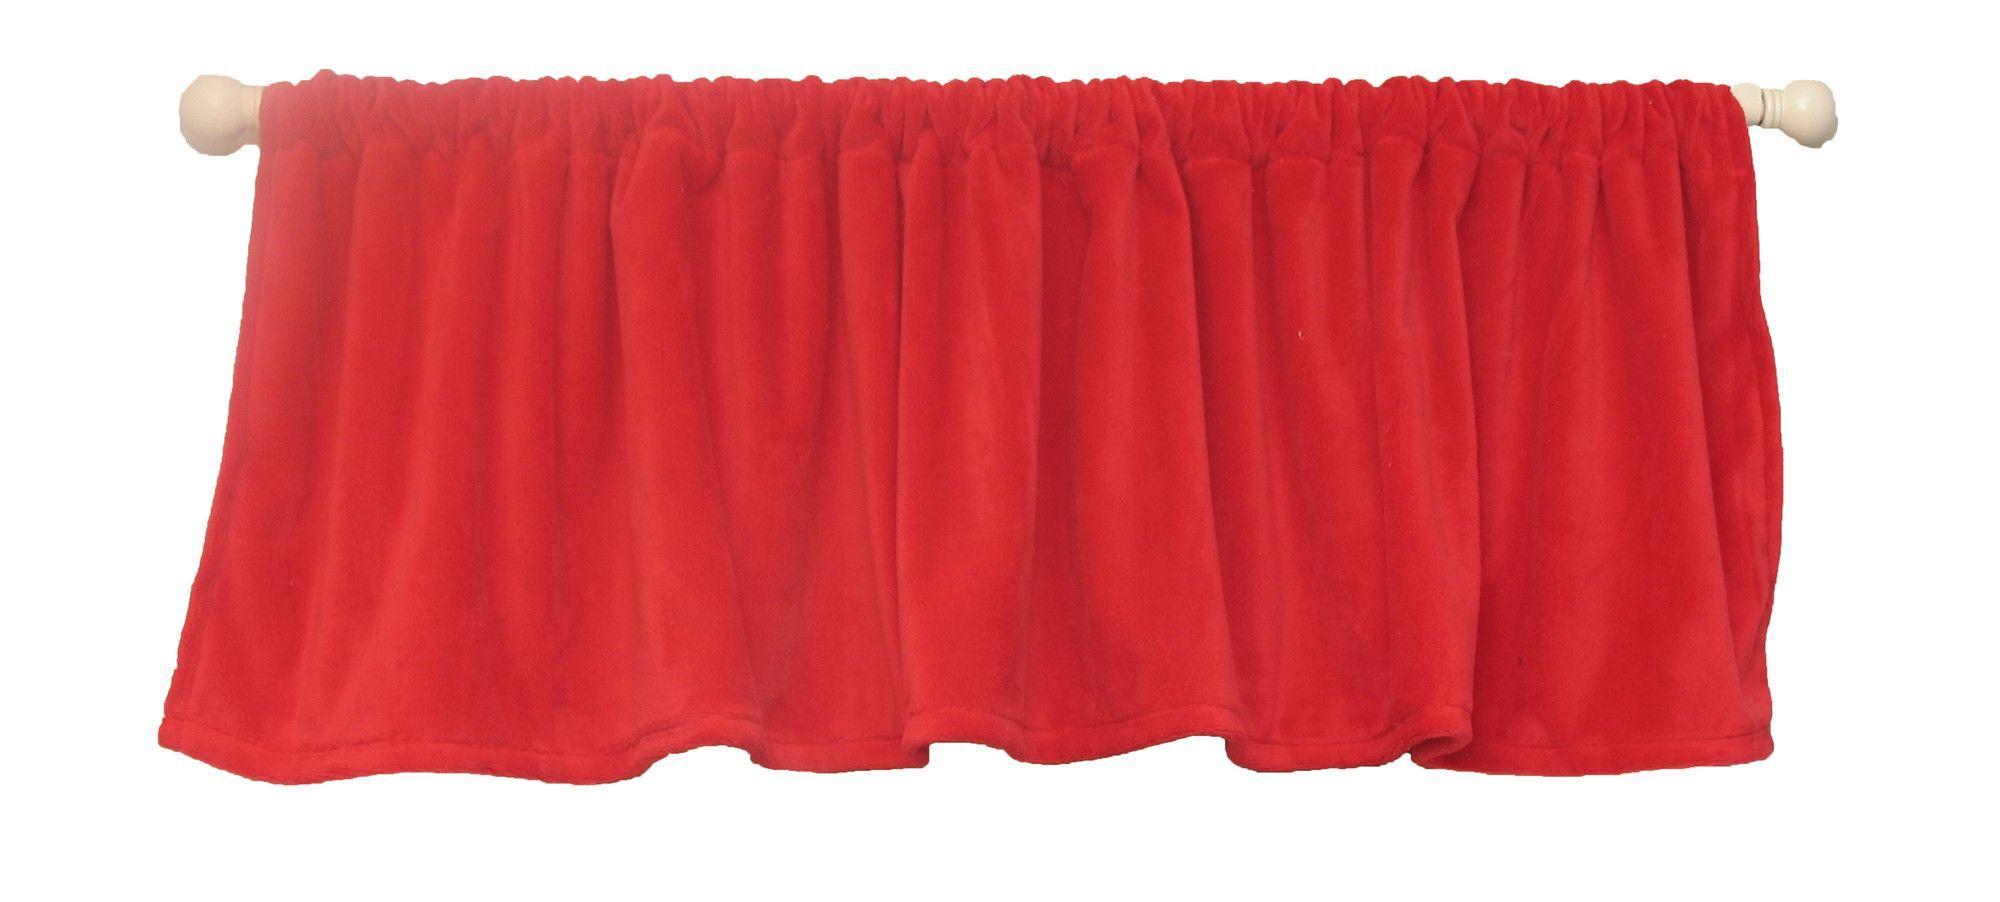 "Giddy Up 54"" Curtain Valance"